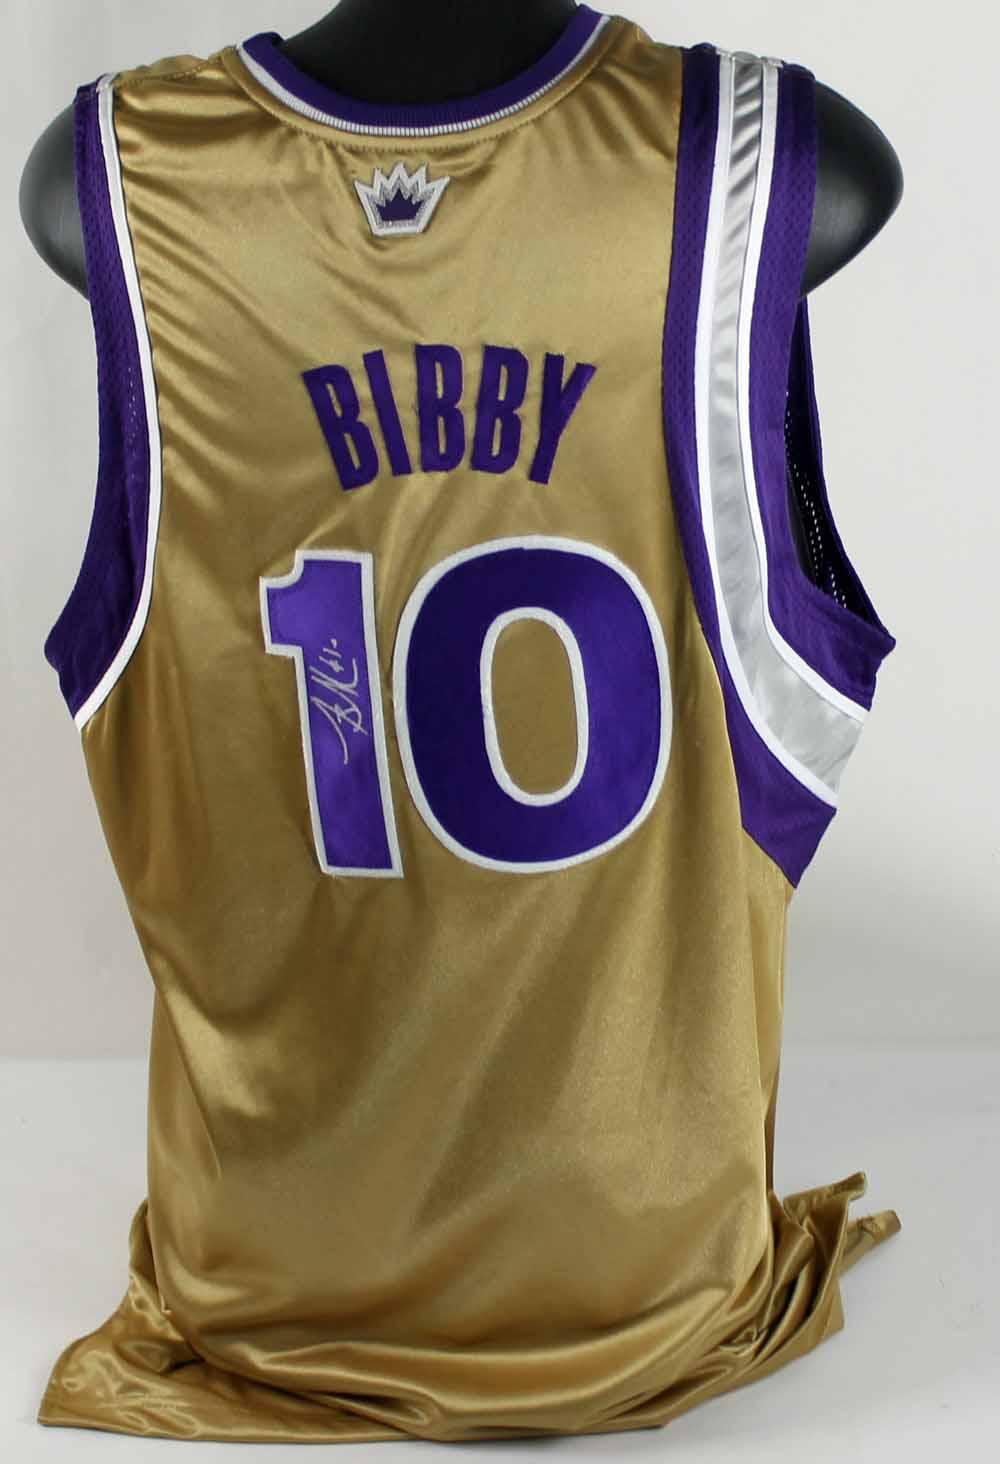 175a8fea3 Lot of 2 Mike Bibby Game-Used   Signed Sacramento Kings Jerseys (PSA  ...